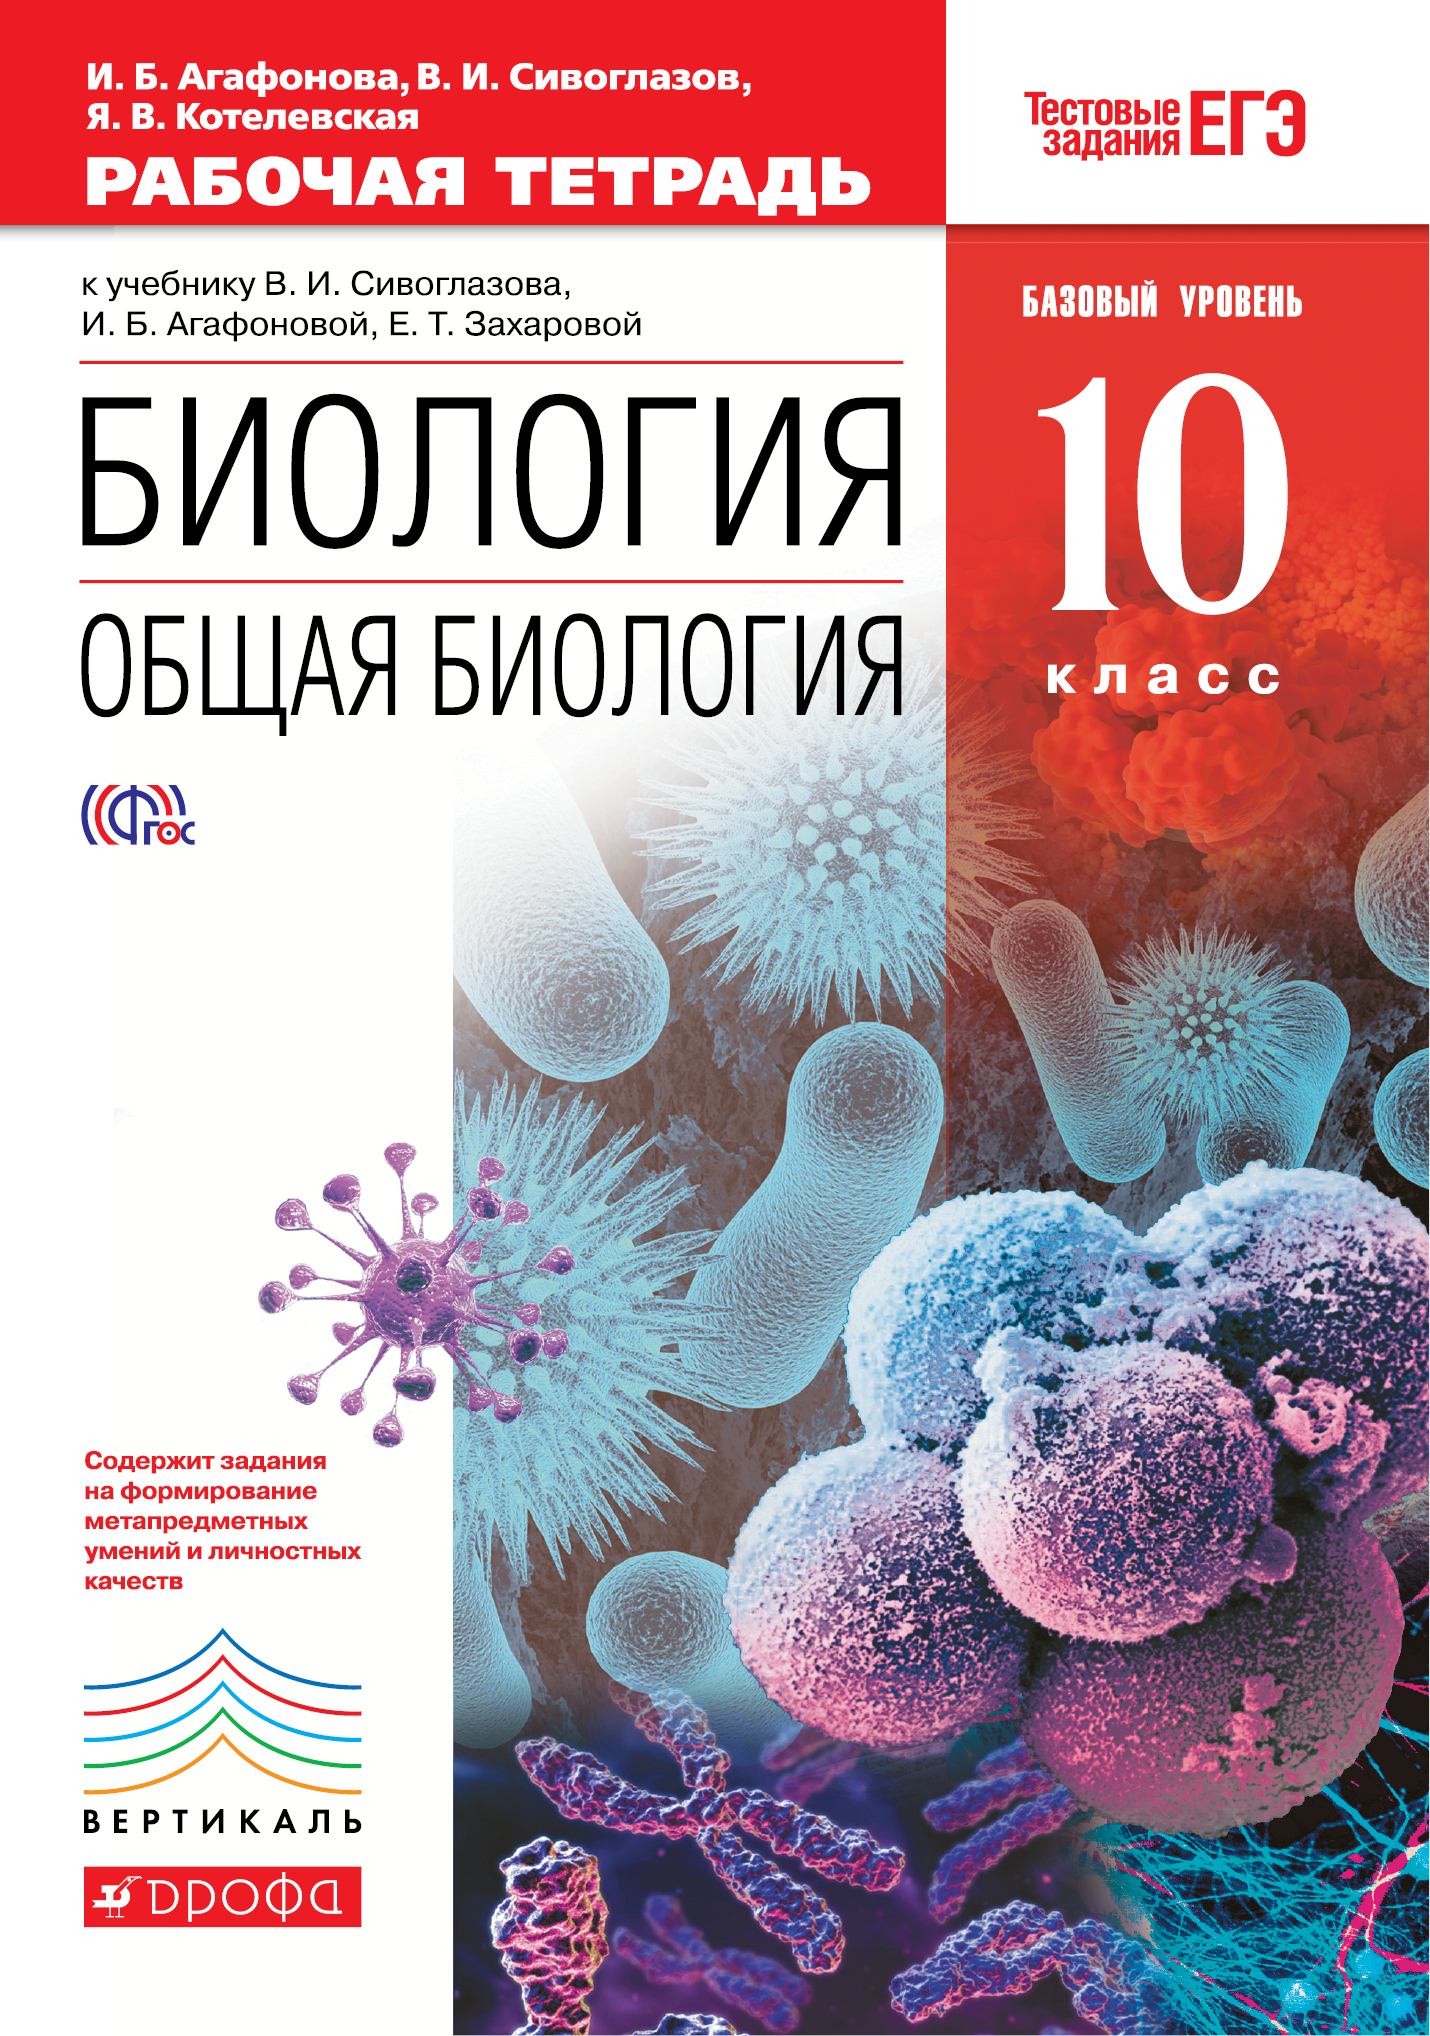 Общая биология 10кл [Р/т+ЕГЭ] баз.ур. Вертикаль